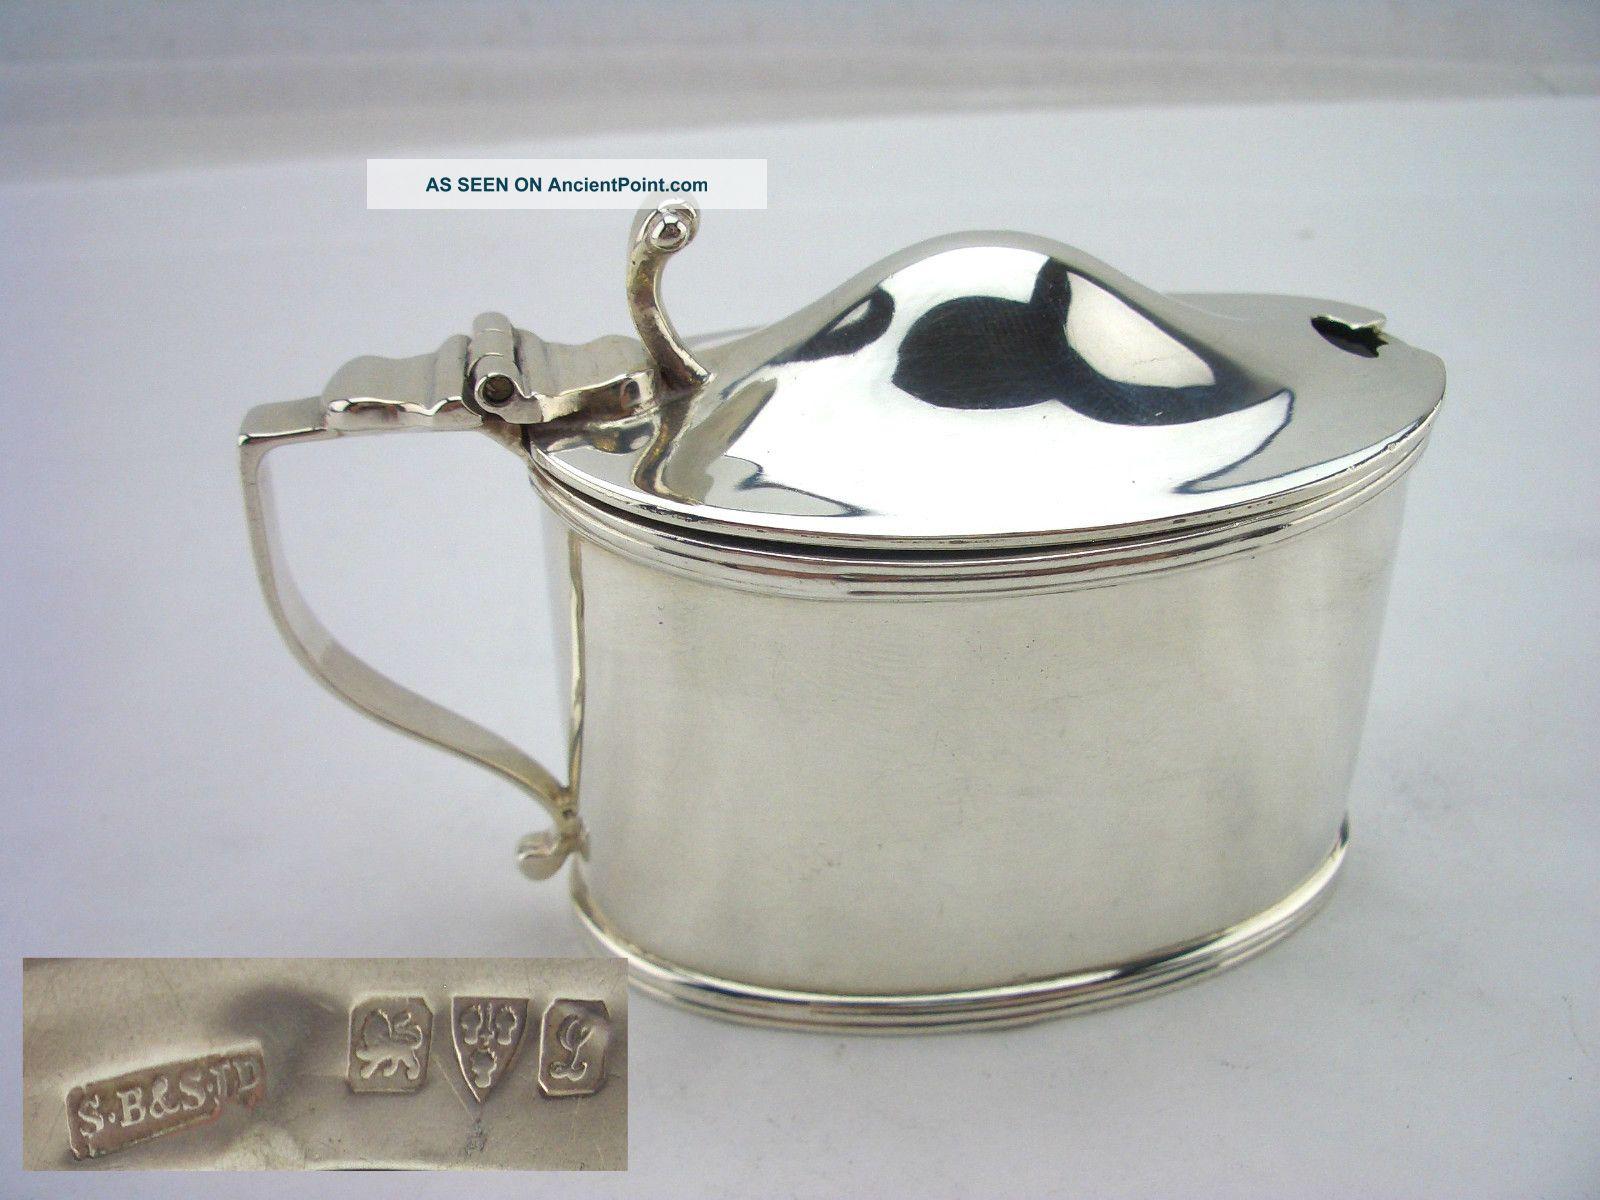 Chester Silver Mustard - 1911 - Blankensee & Sons Mustard Pots photo